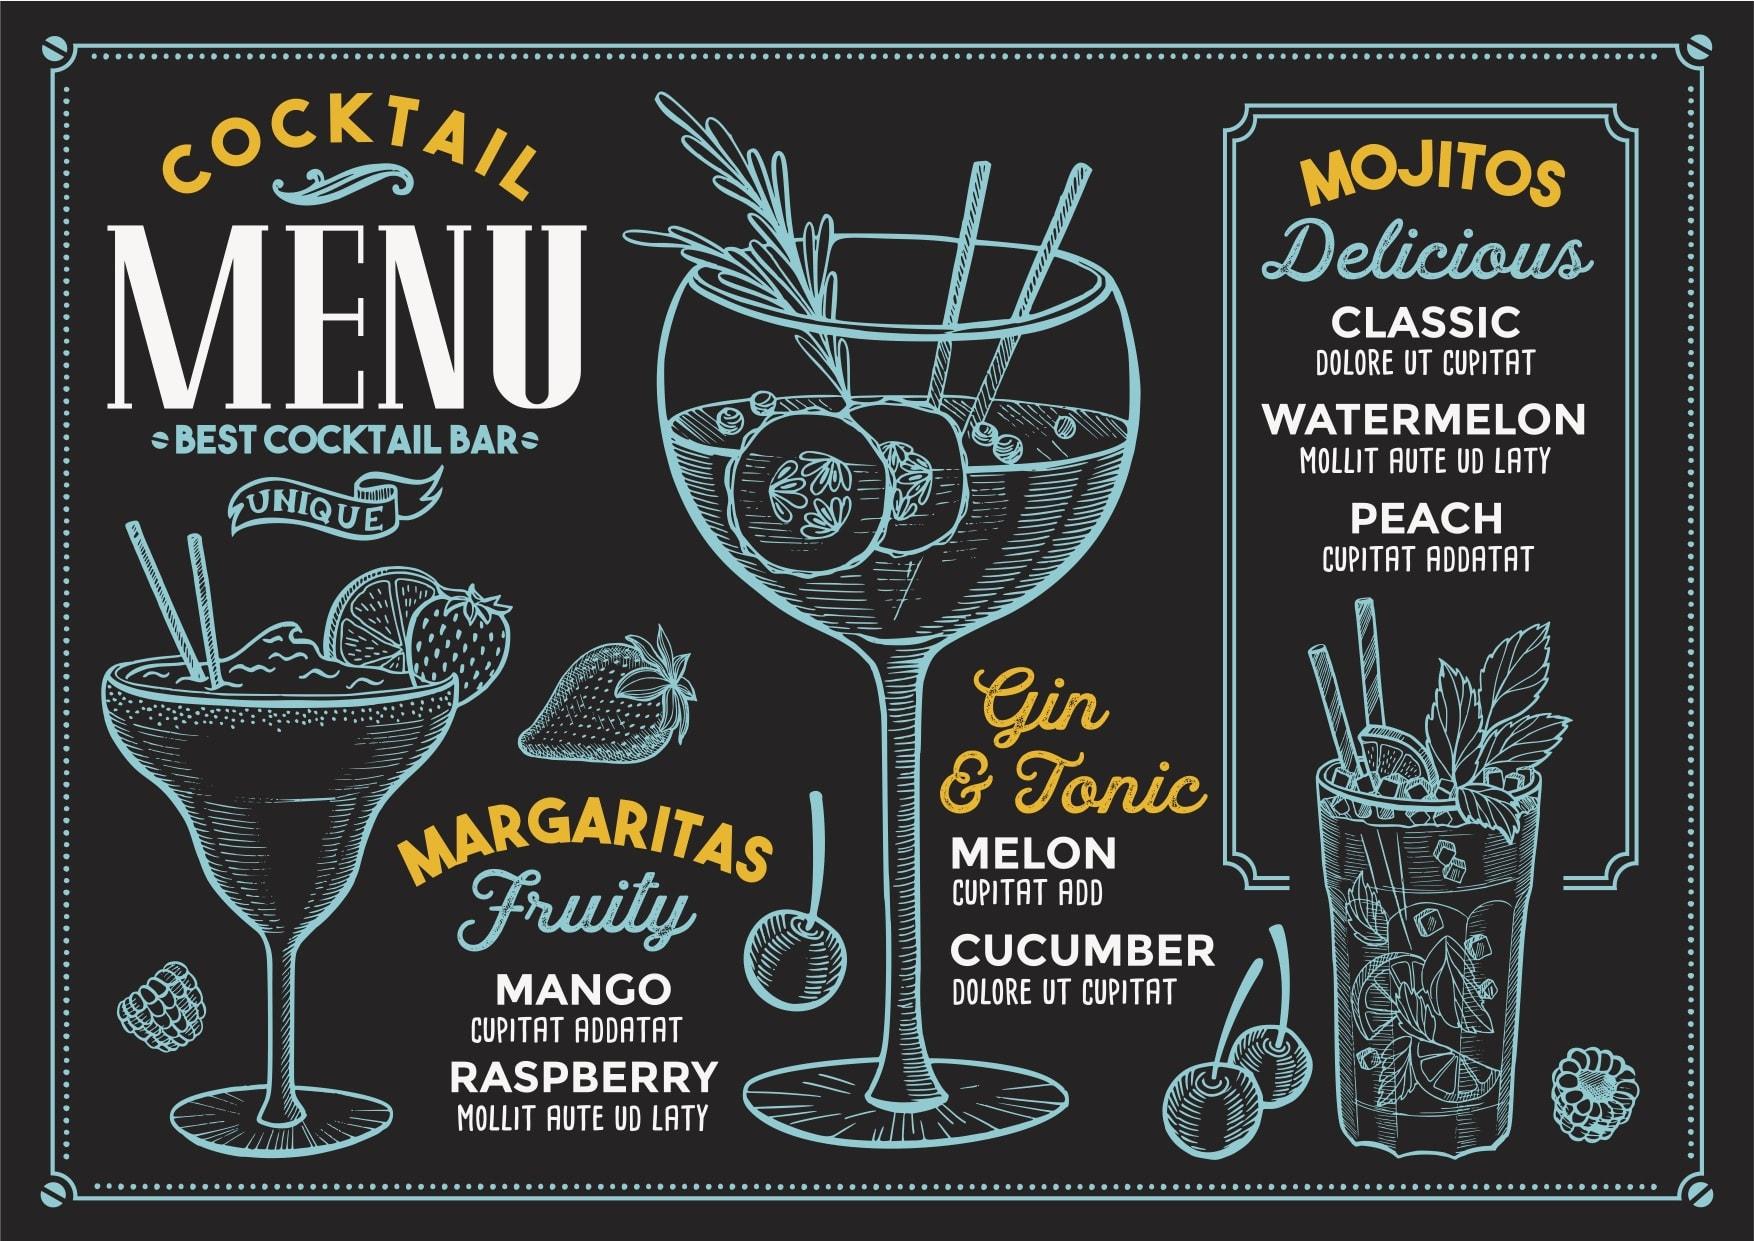 menu, cocktails, alcohol inventory software, wisk